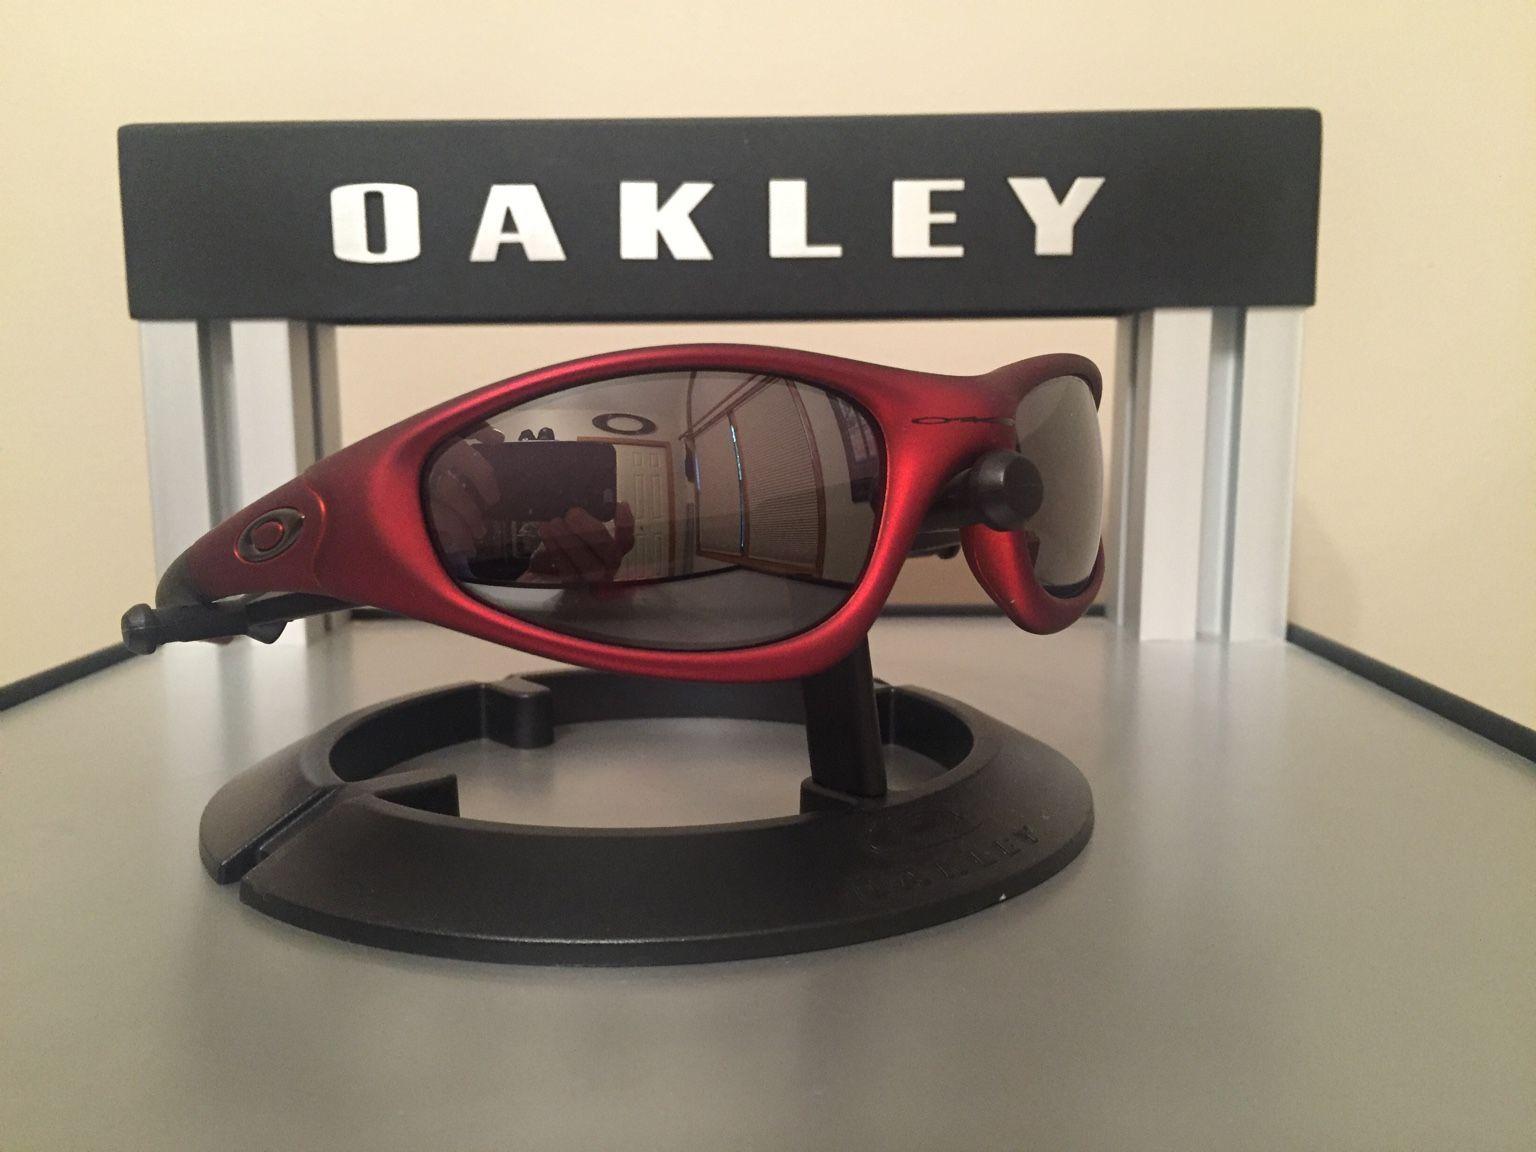 Oakley Straight Jacket....FMJ Red/BI - a39878d3978d6355da4ca5ec27480a16.jpg